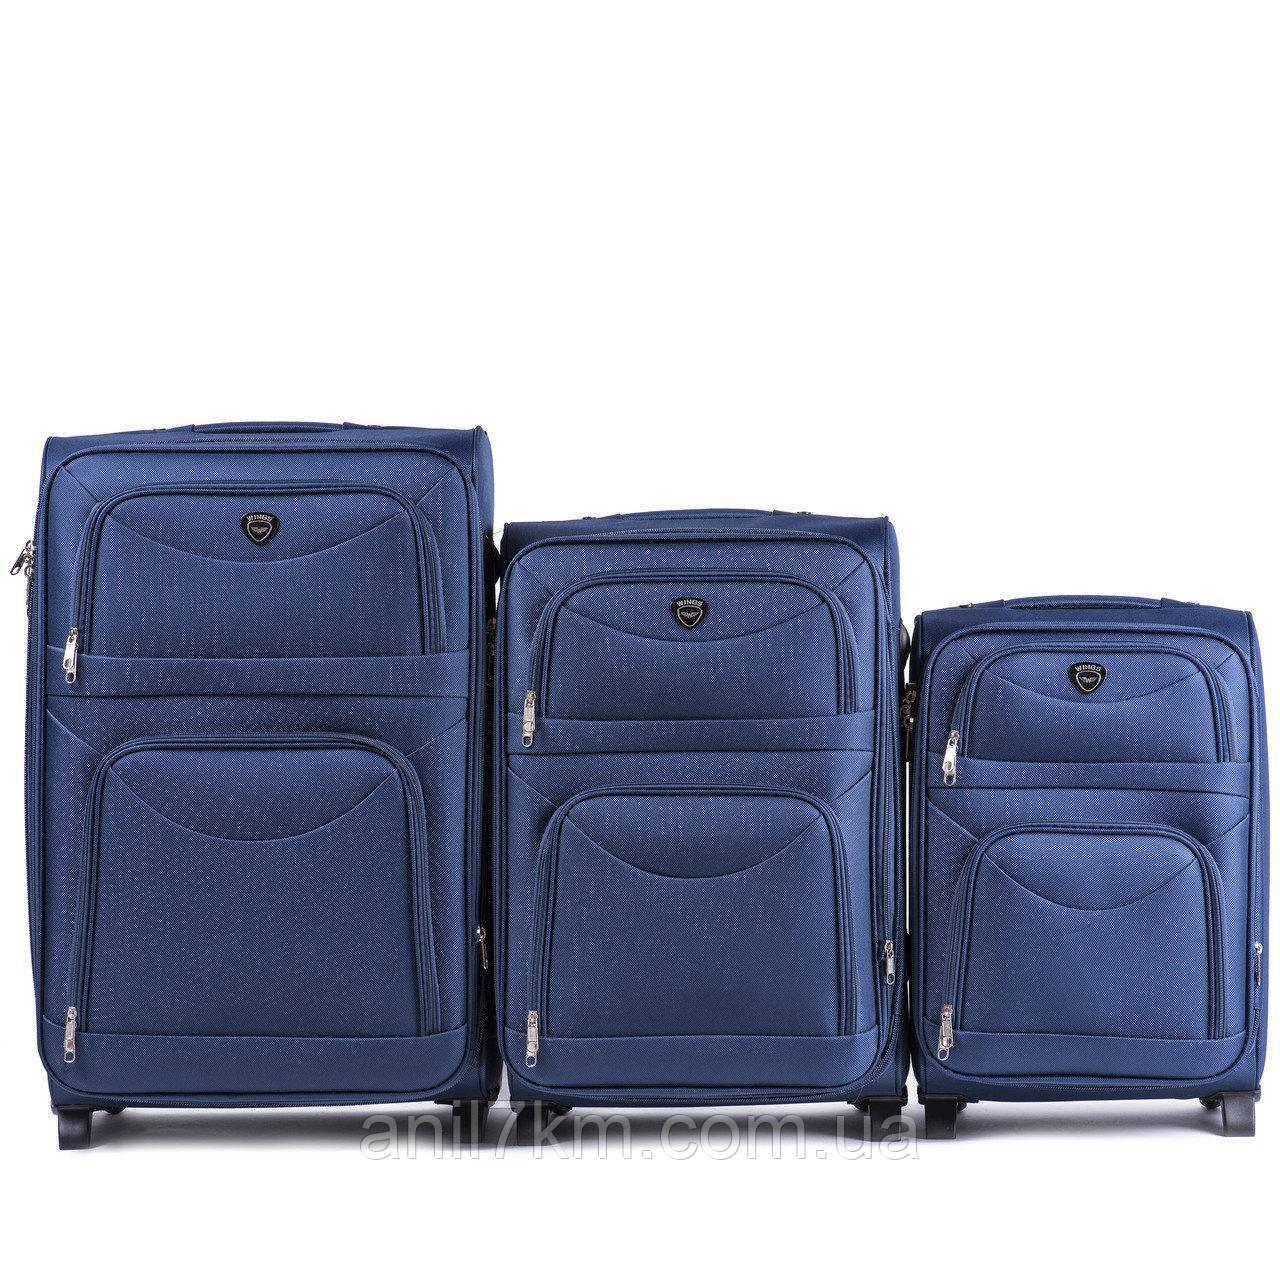 Комплект валіз 3-ка.на колесах wings